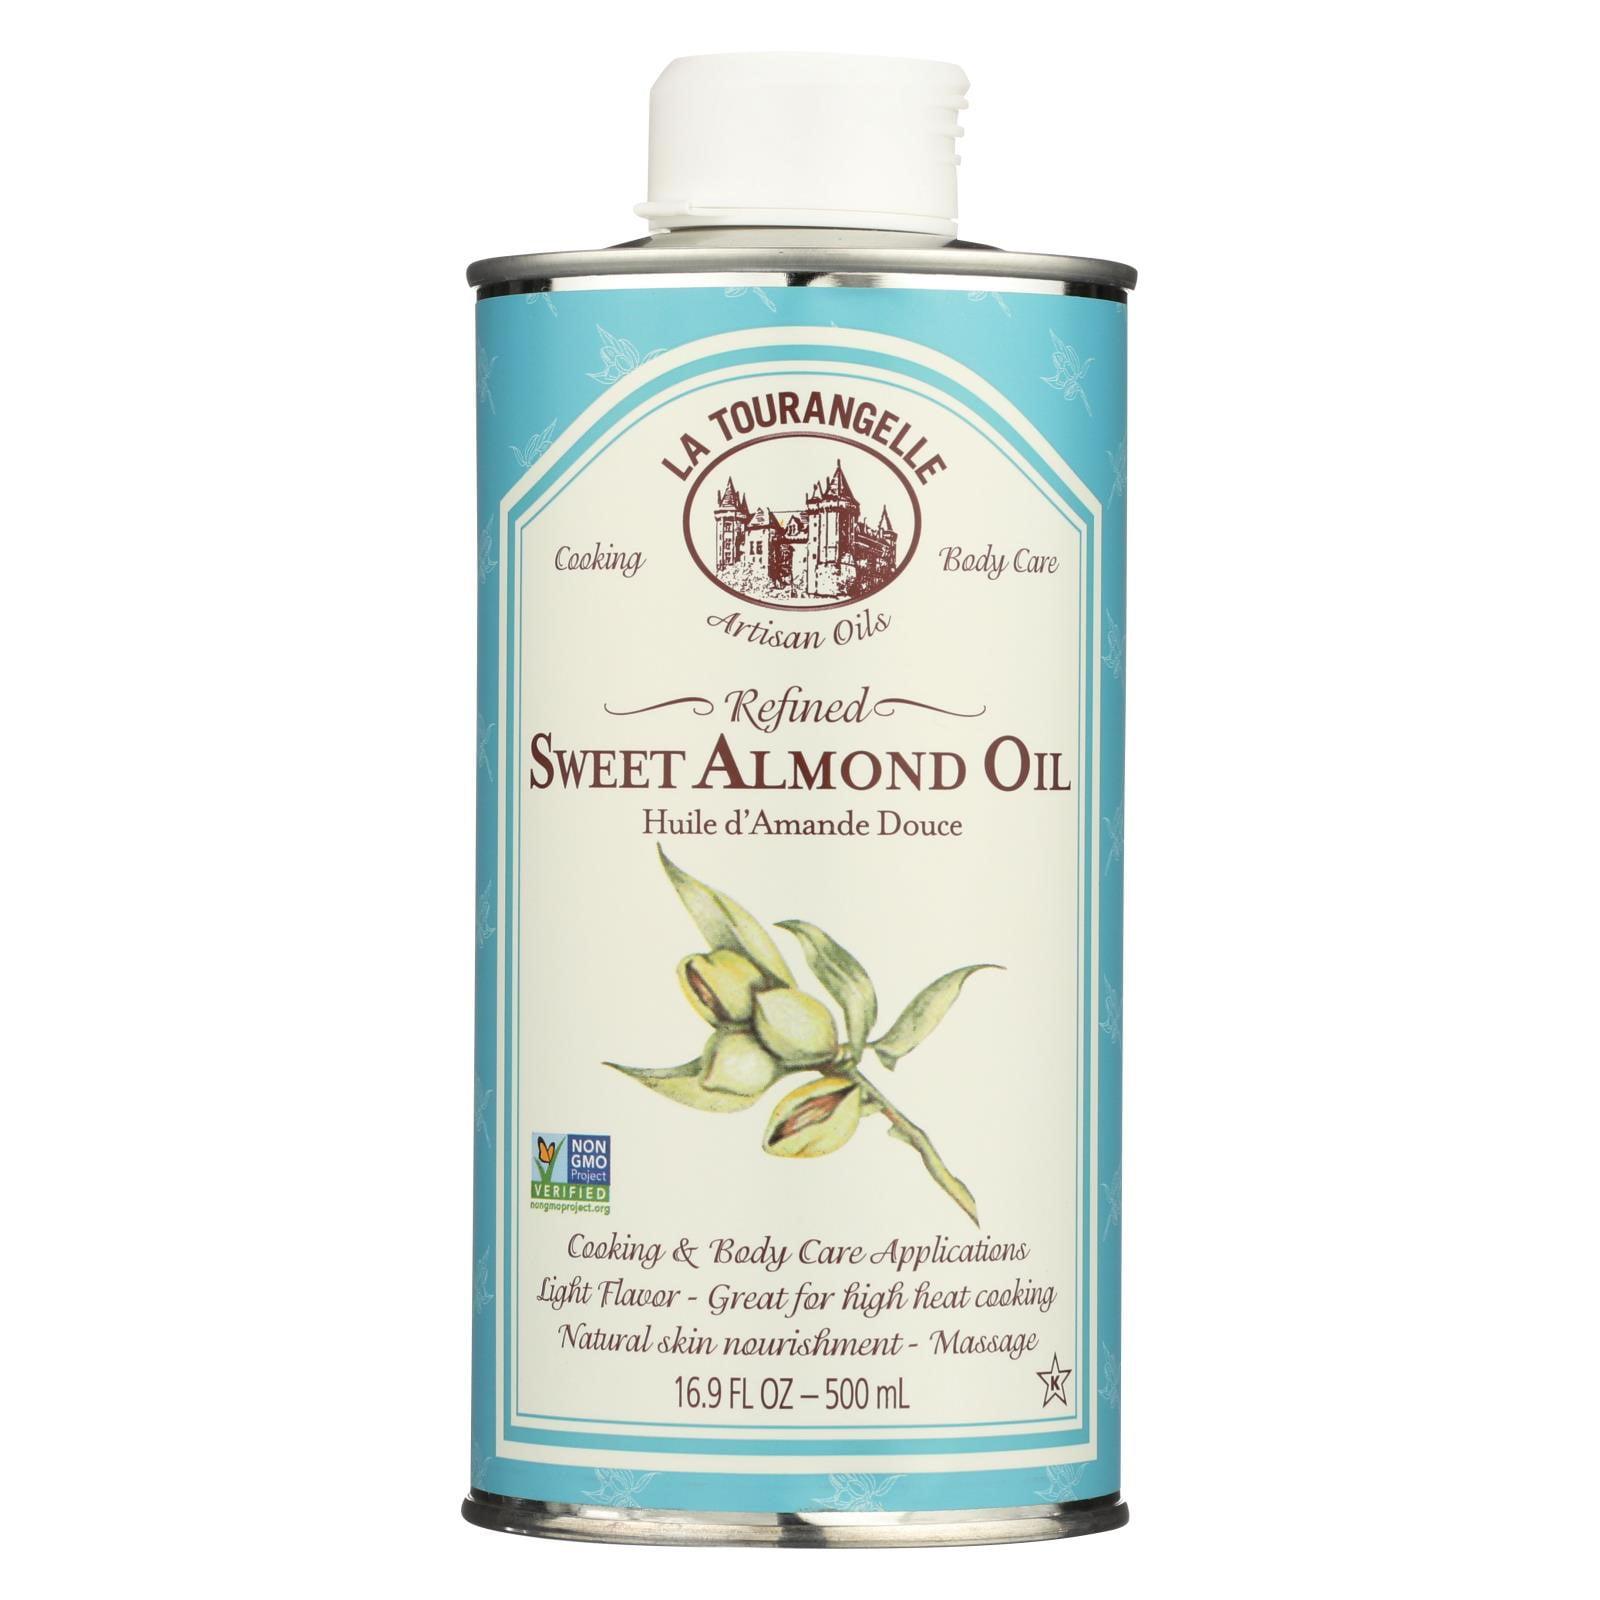 La Tourangelle Sweet Almond Oil - 16.9 Fl oz.